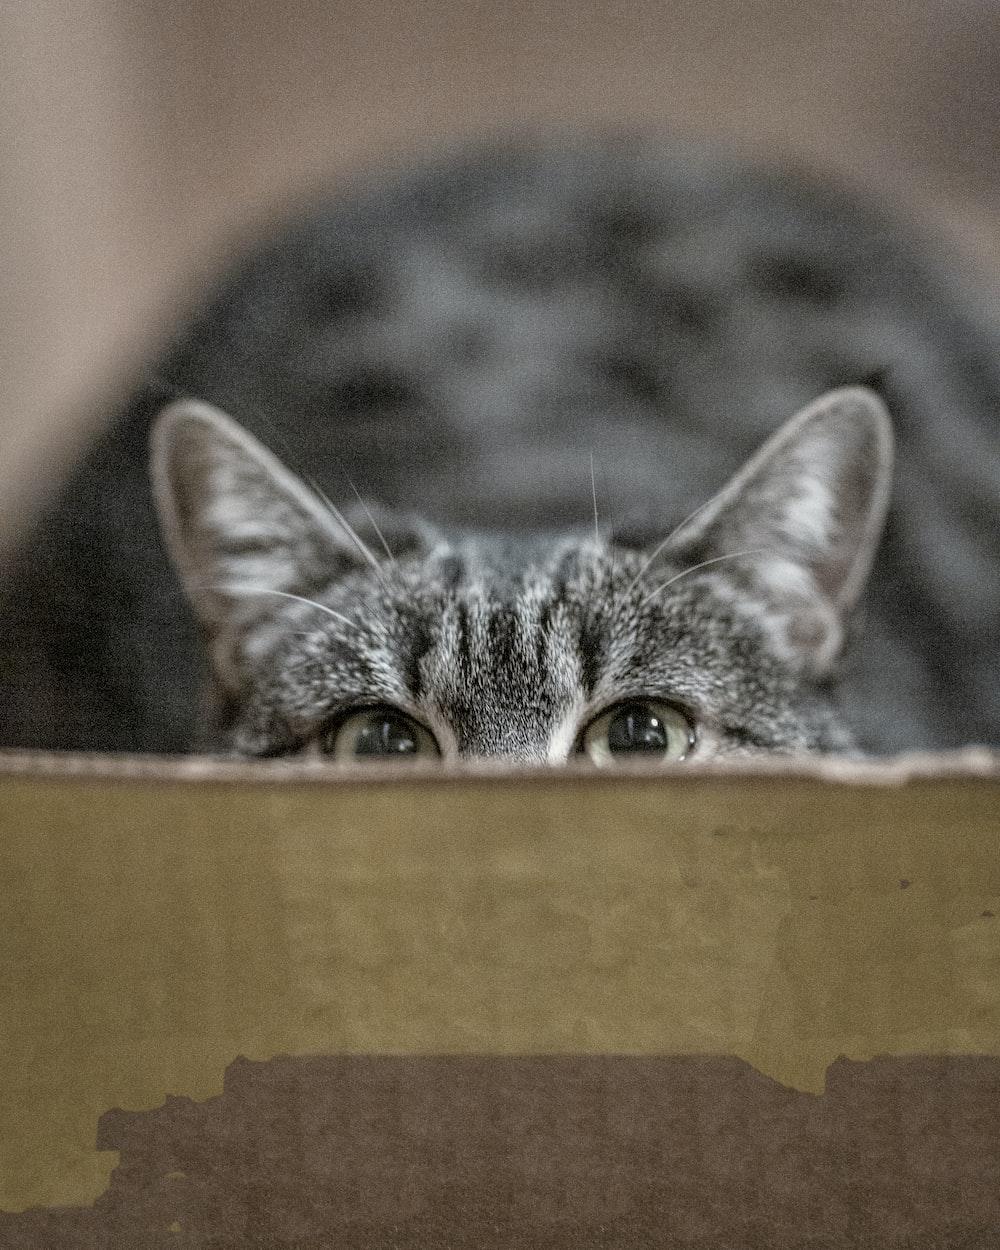 silver tabby cat hiding on box